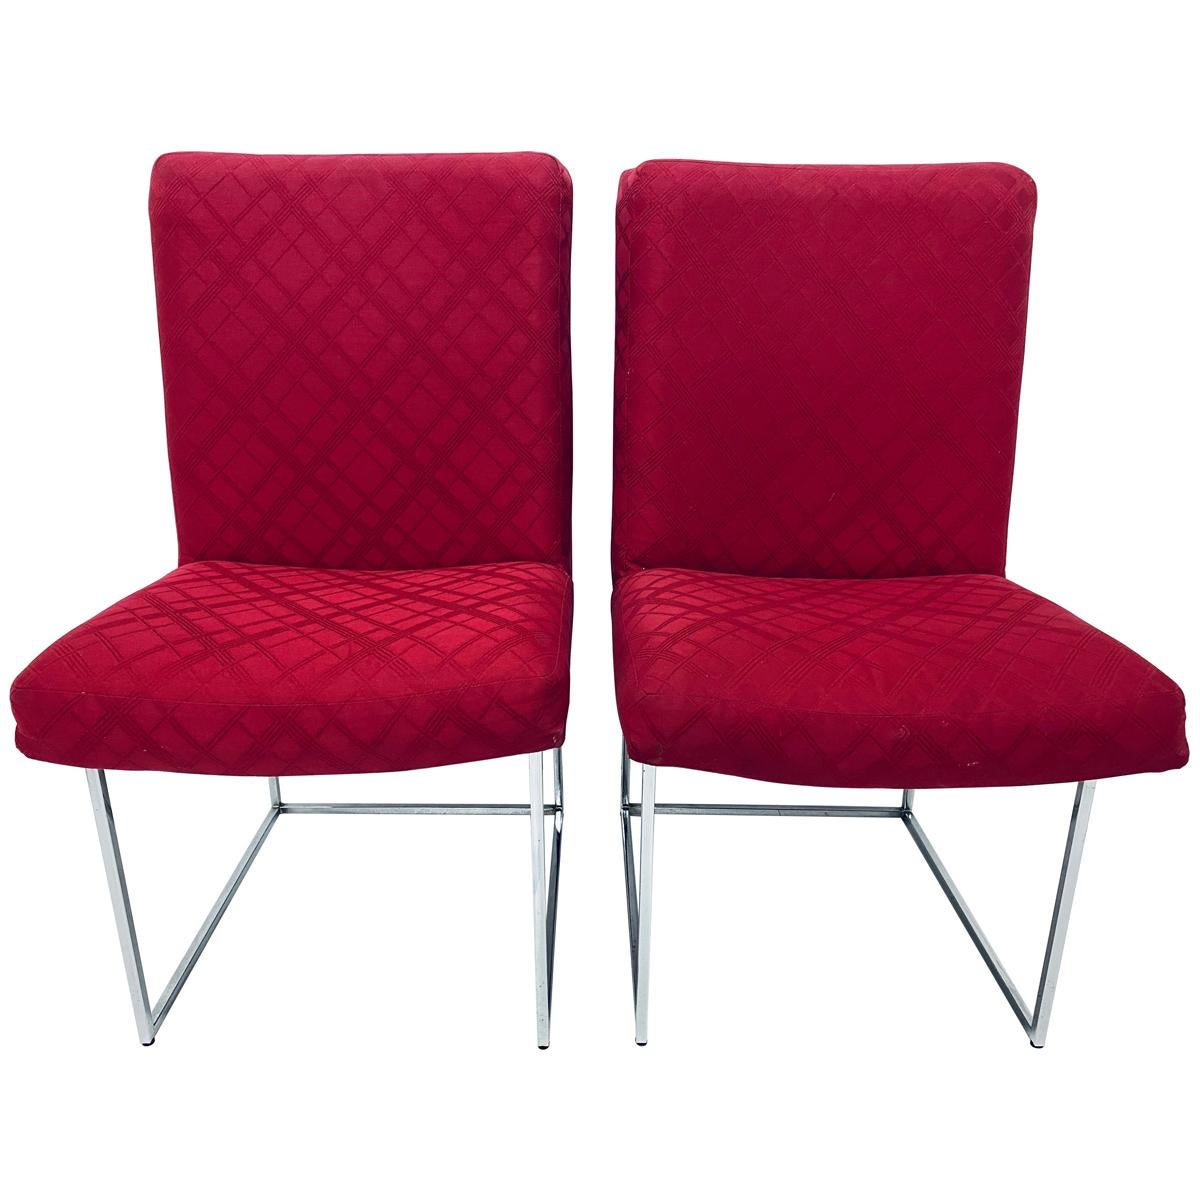 Milo Baughman Thin-Line Chrome Dining Chairs for Thayer Coggin, a Pair